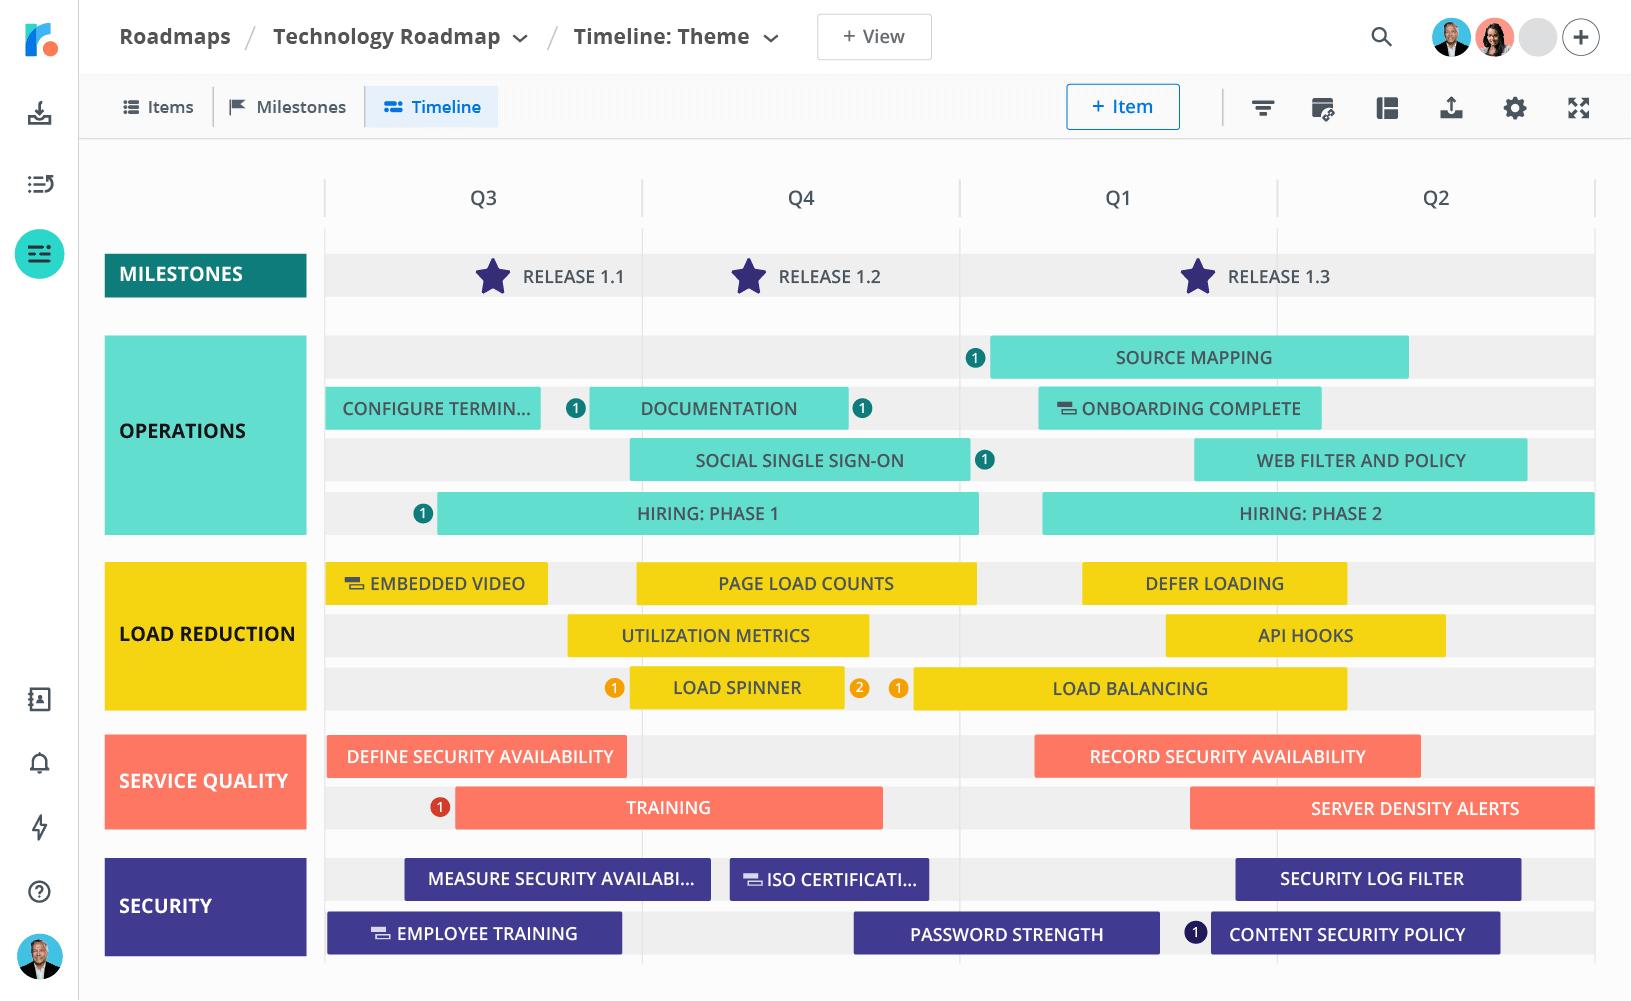 Roadmunk product roadmapping